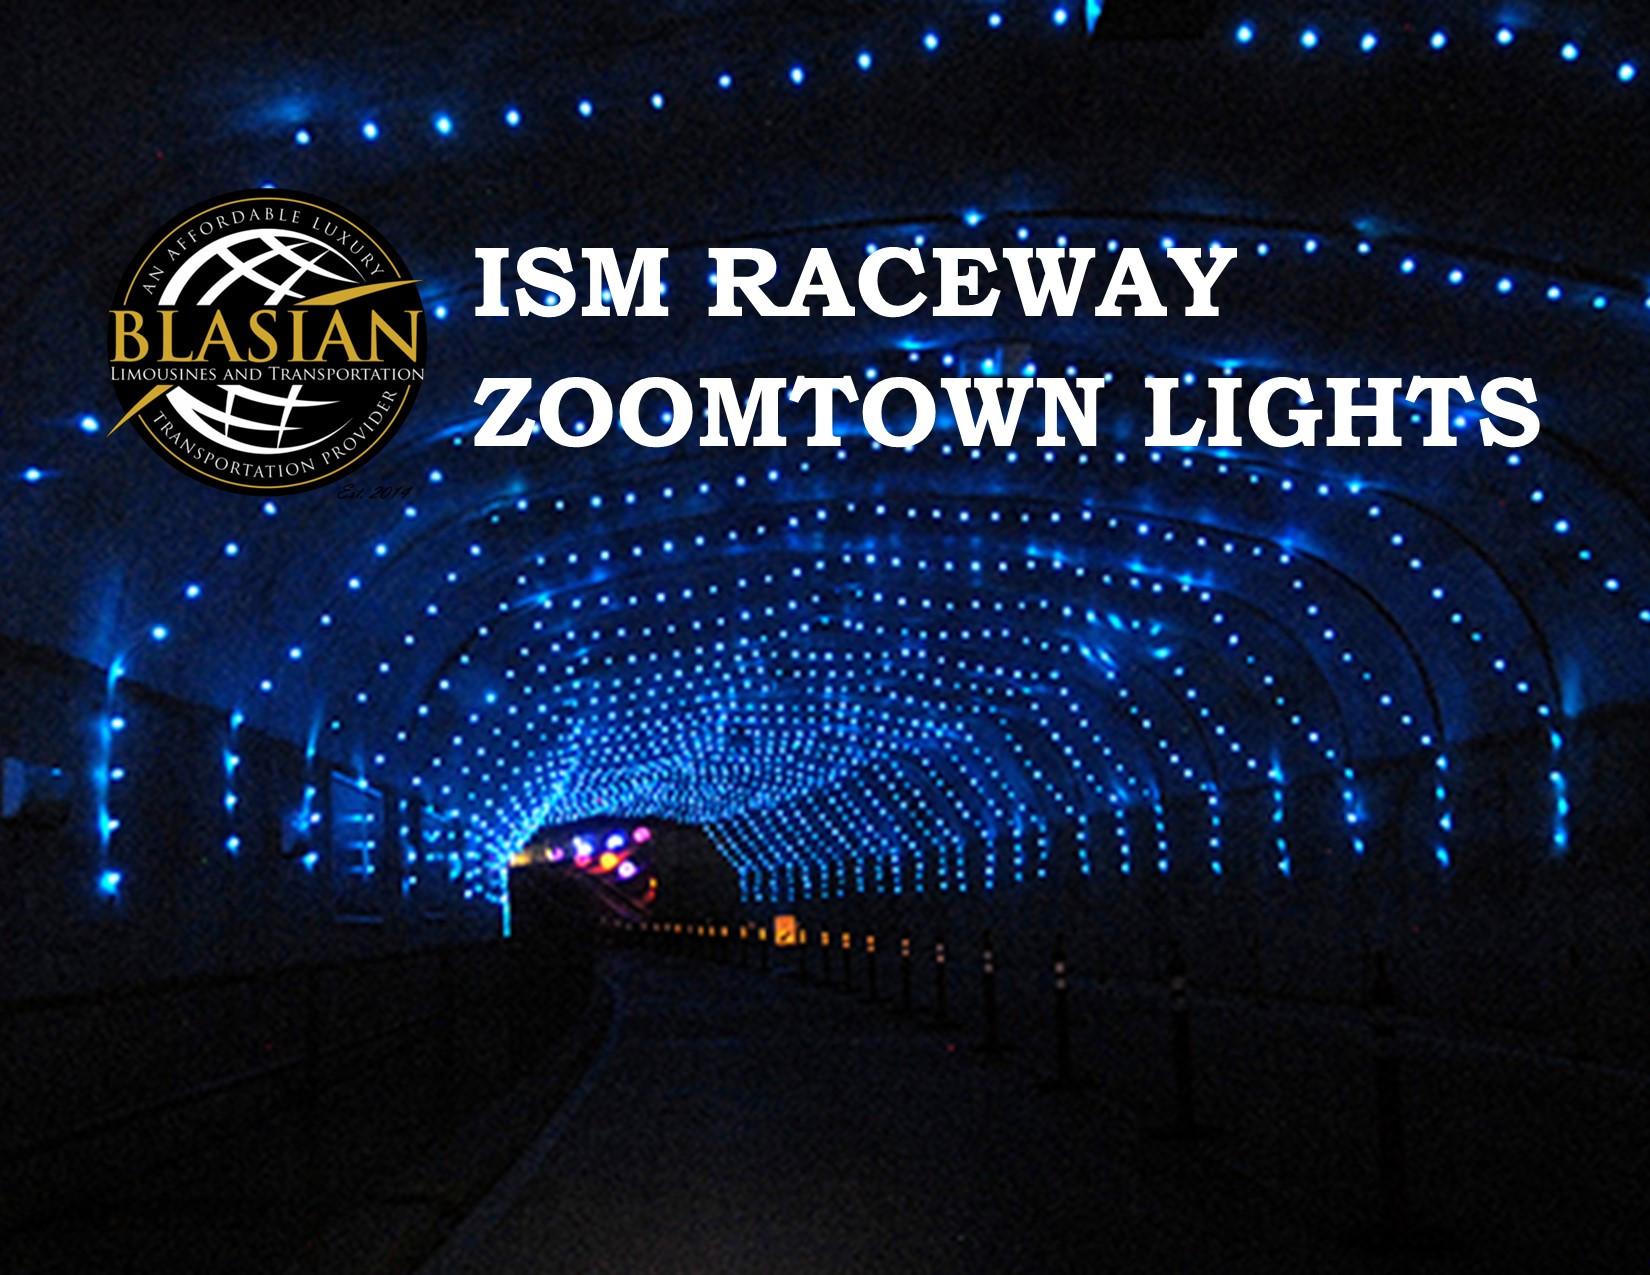 ISM Raceway ZOOMTOWN LIGHTS